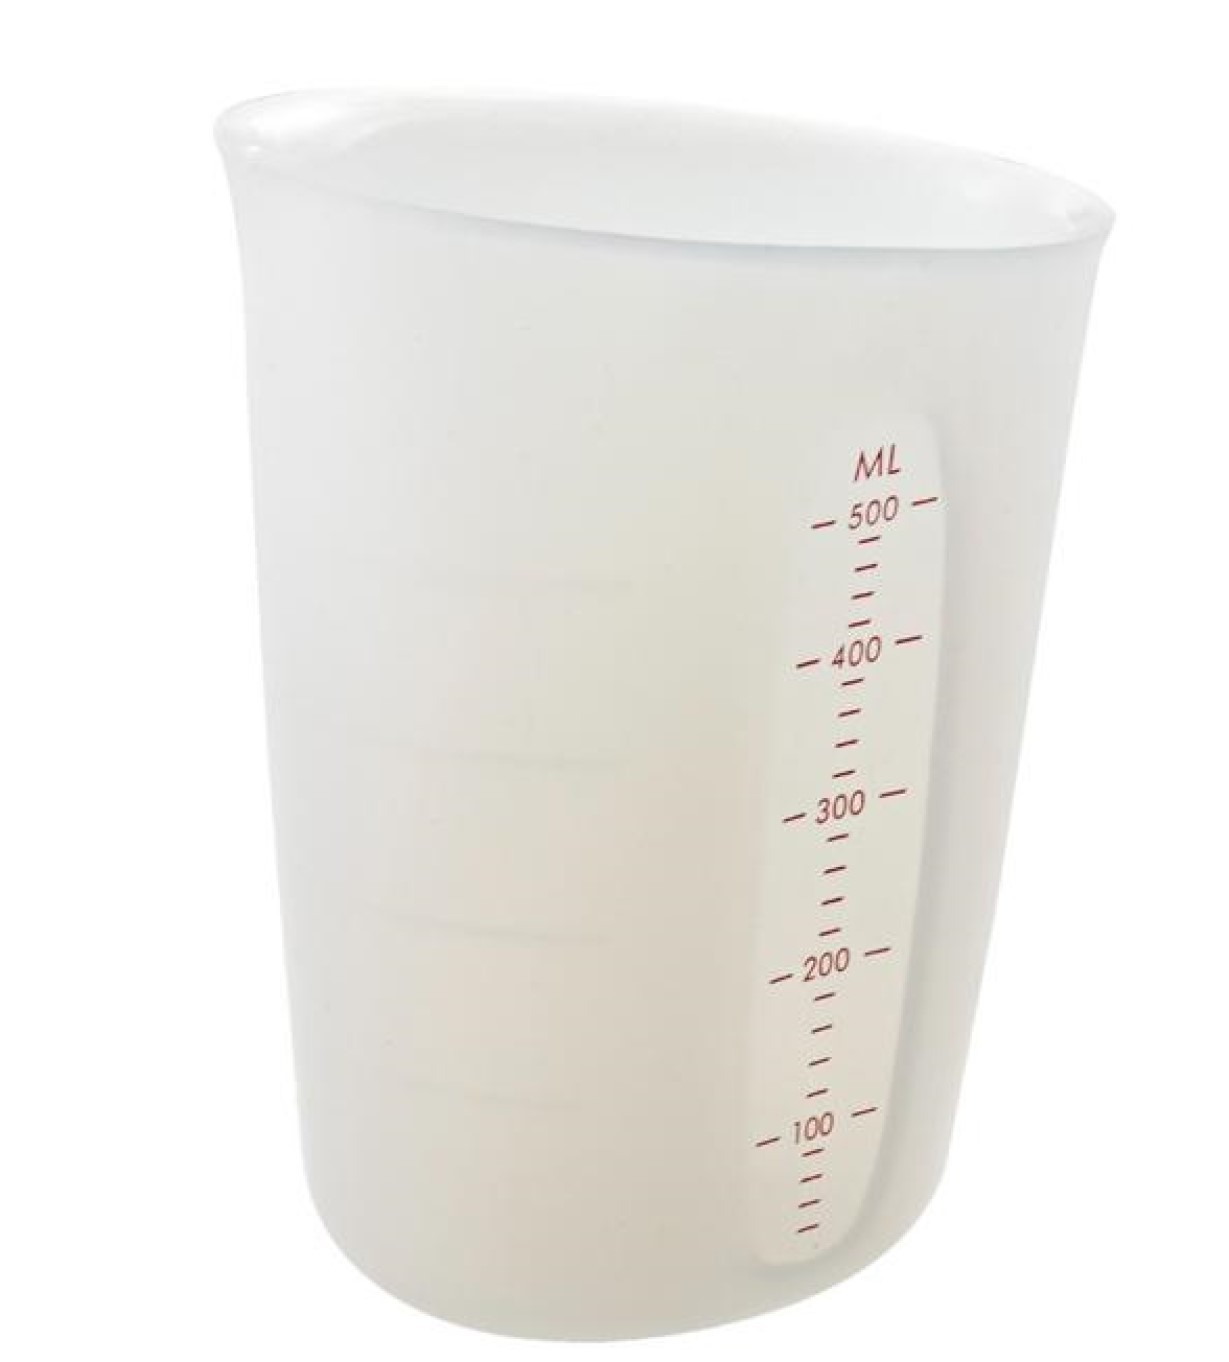 copo medidor flexível silicone jarra medidora cozinha 500mL